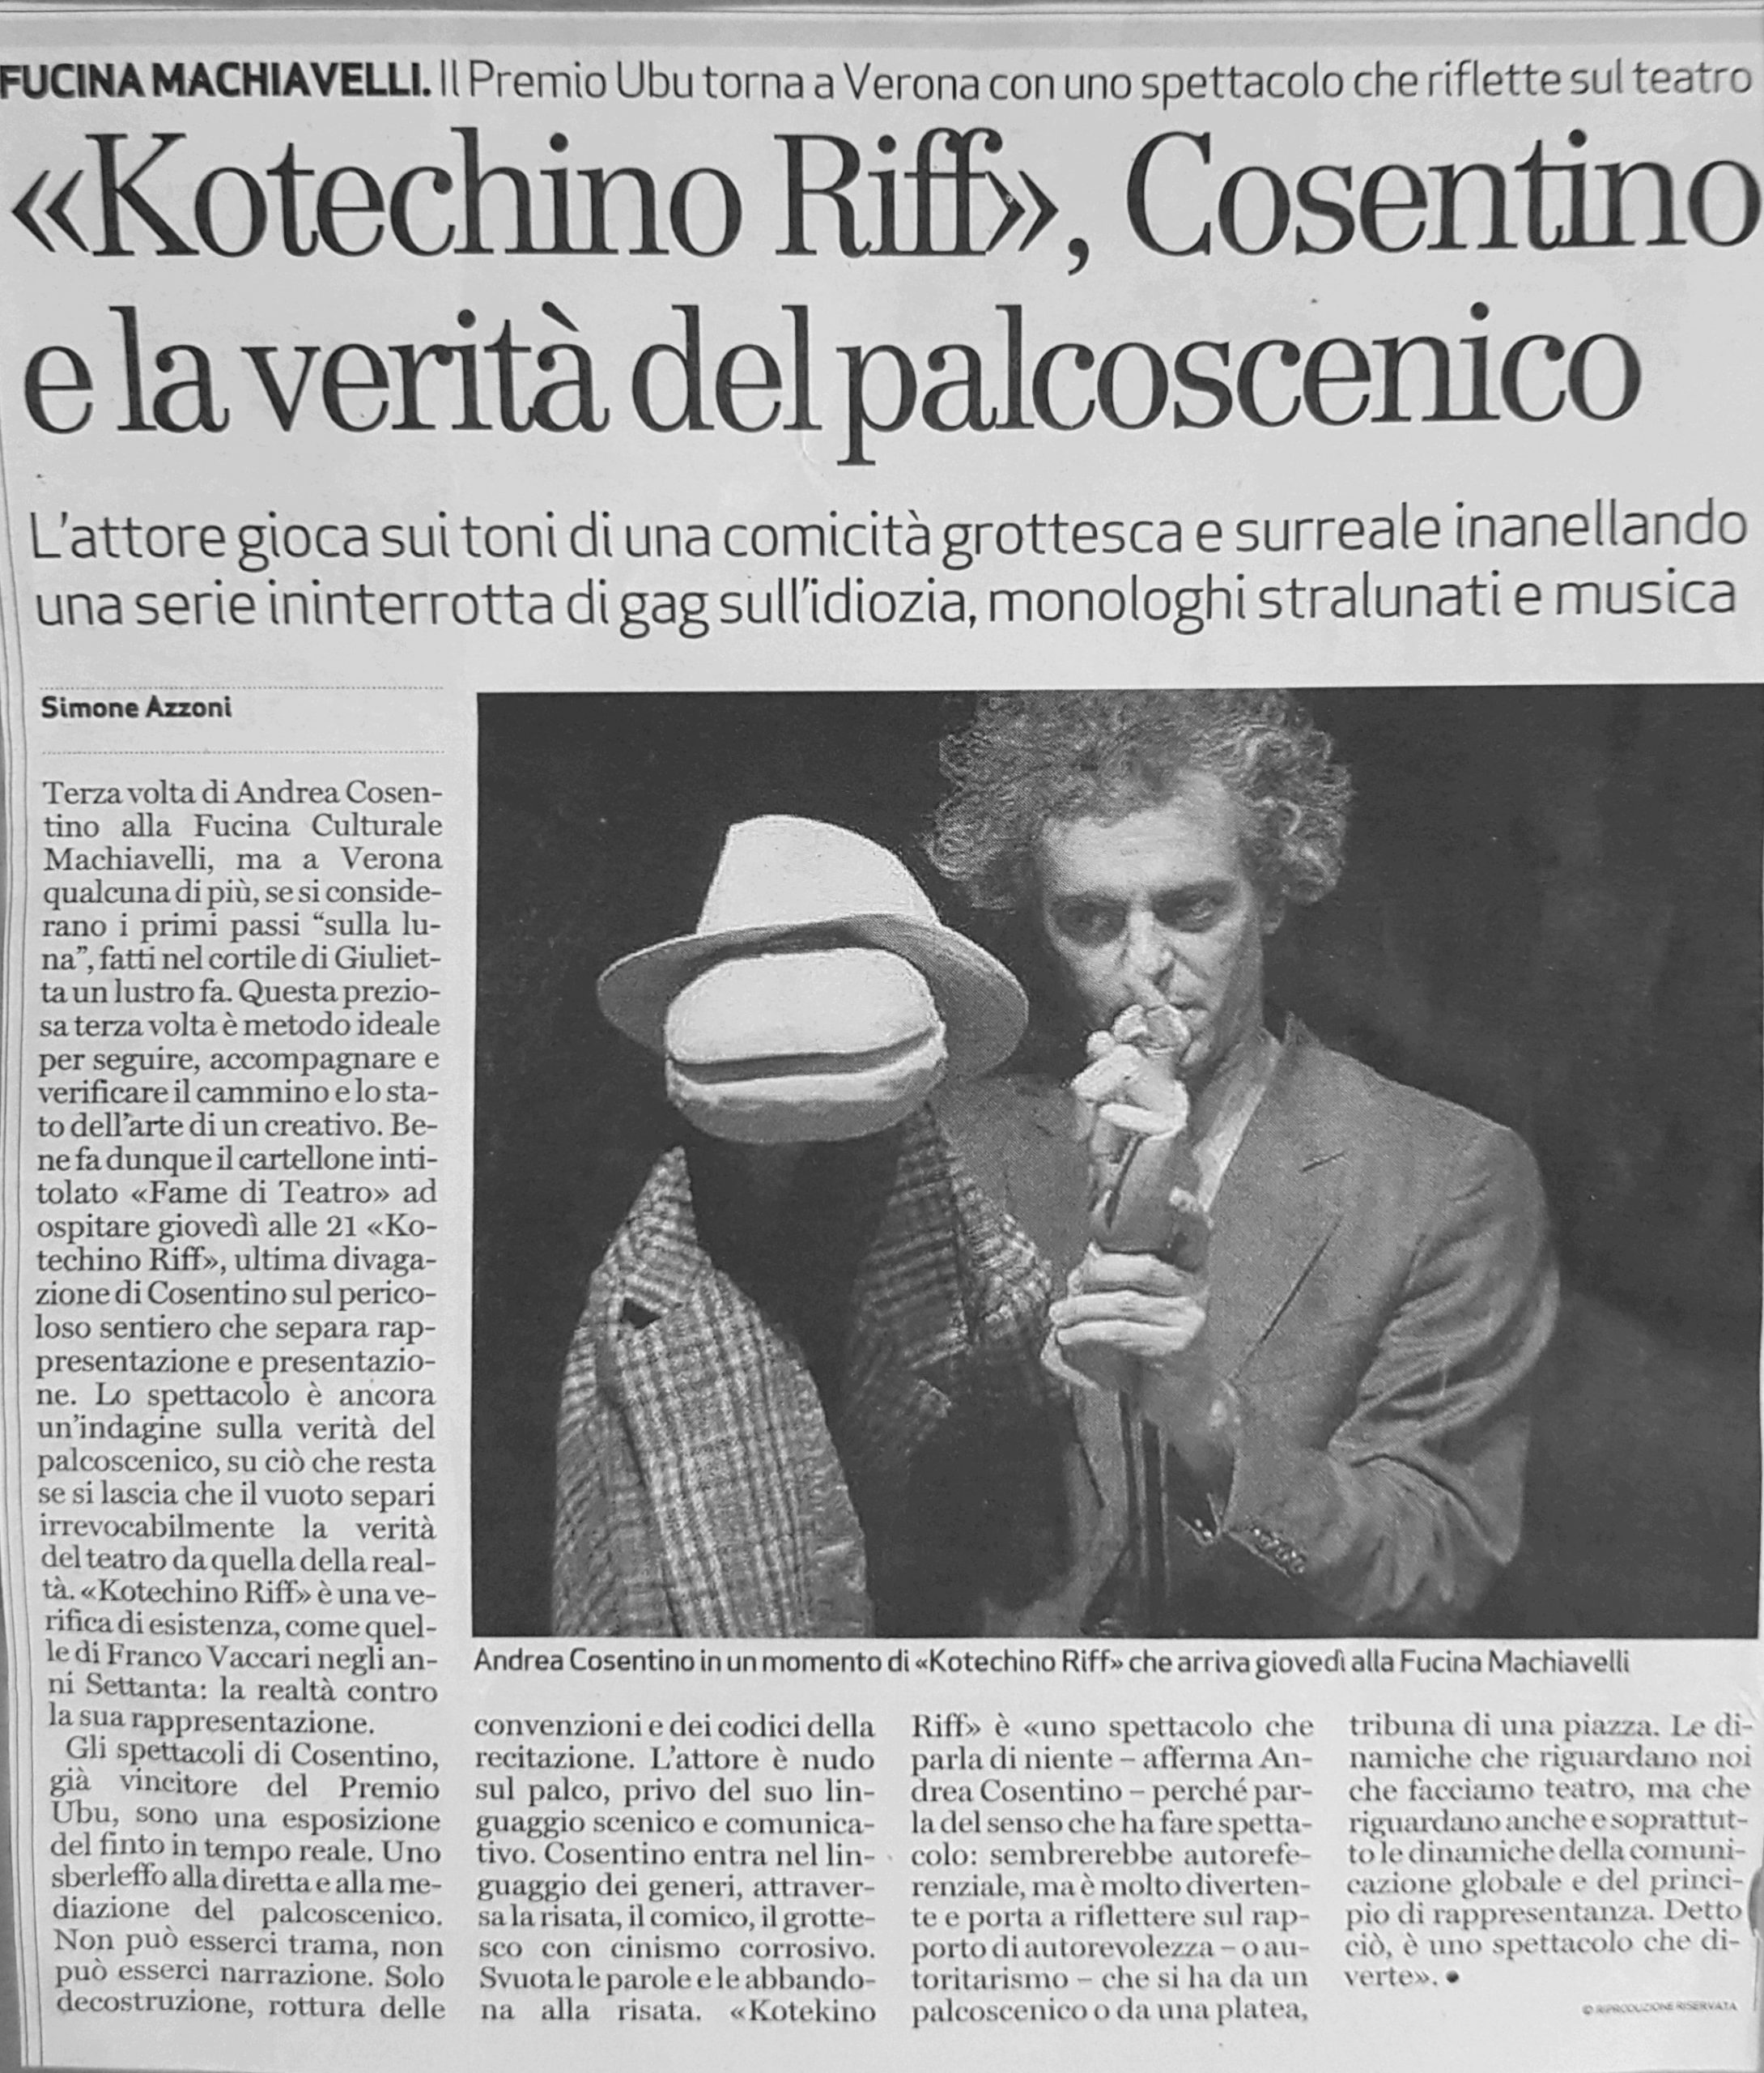 rassegna-stampa-fucina-machiavelli-verona-teatro-kotekino-riff